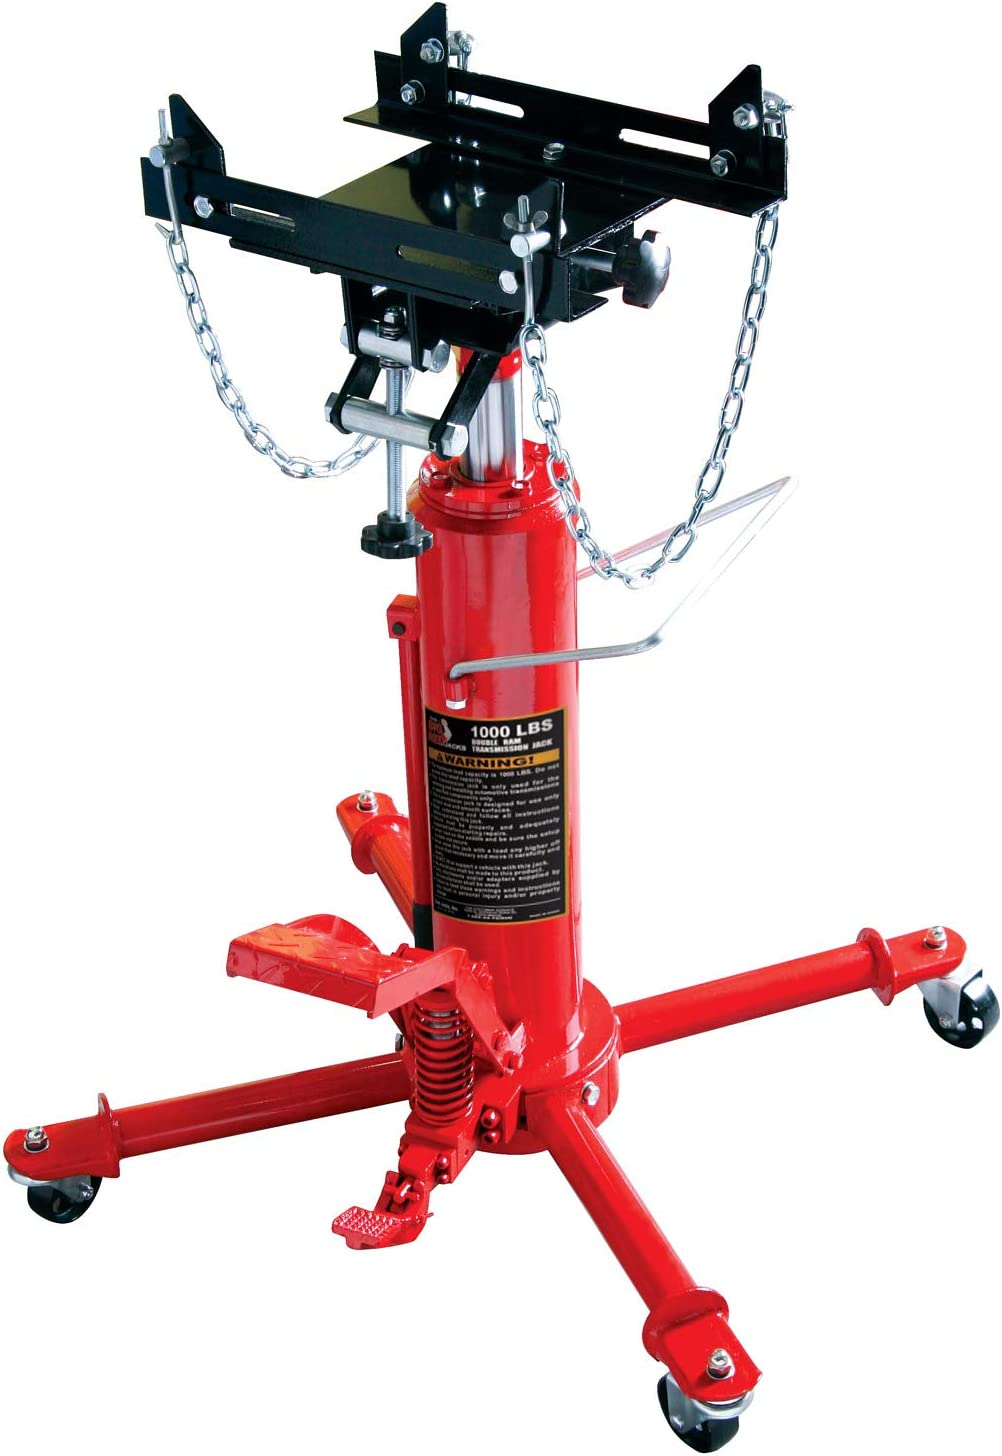 Torin Big Red Hydraulic Transmission Floor Jack Capacity 1 Ton 2,000 lb